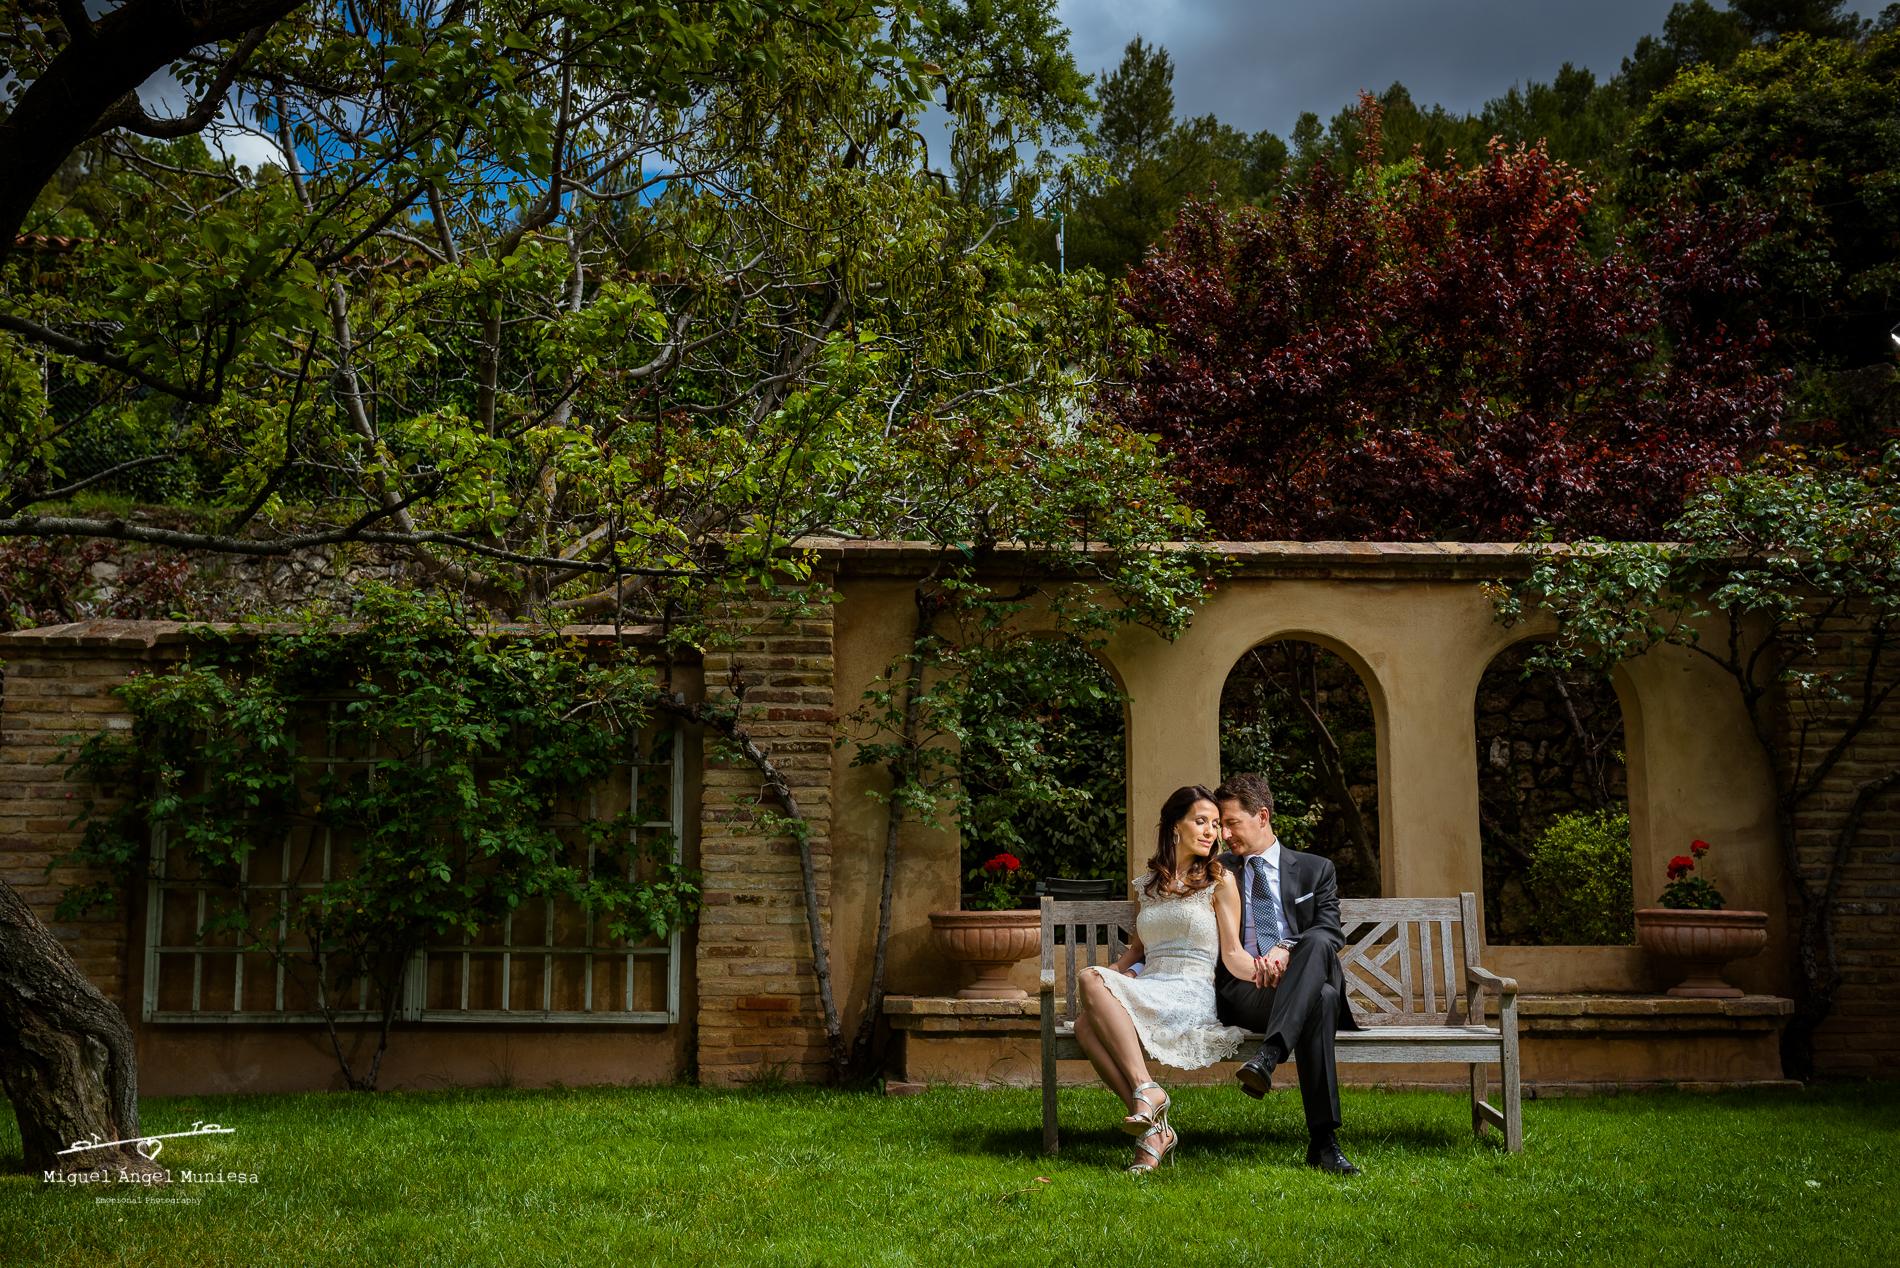 fotografo boda zaragoza, miguel angel muniesa_28